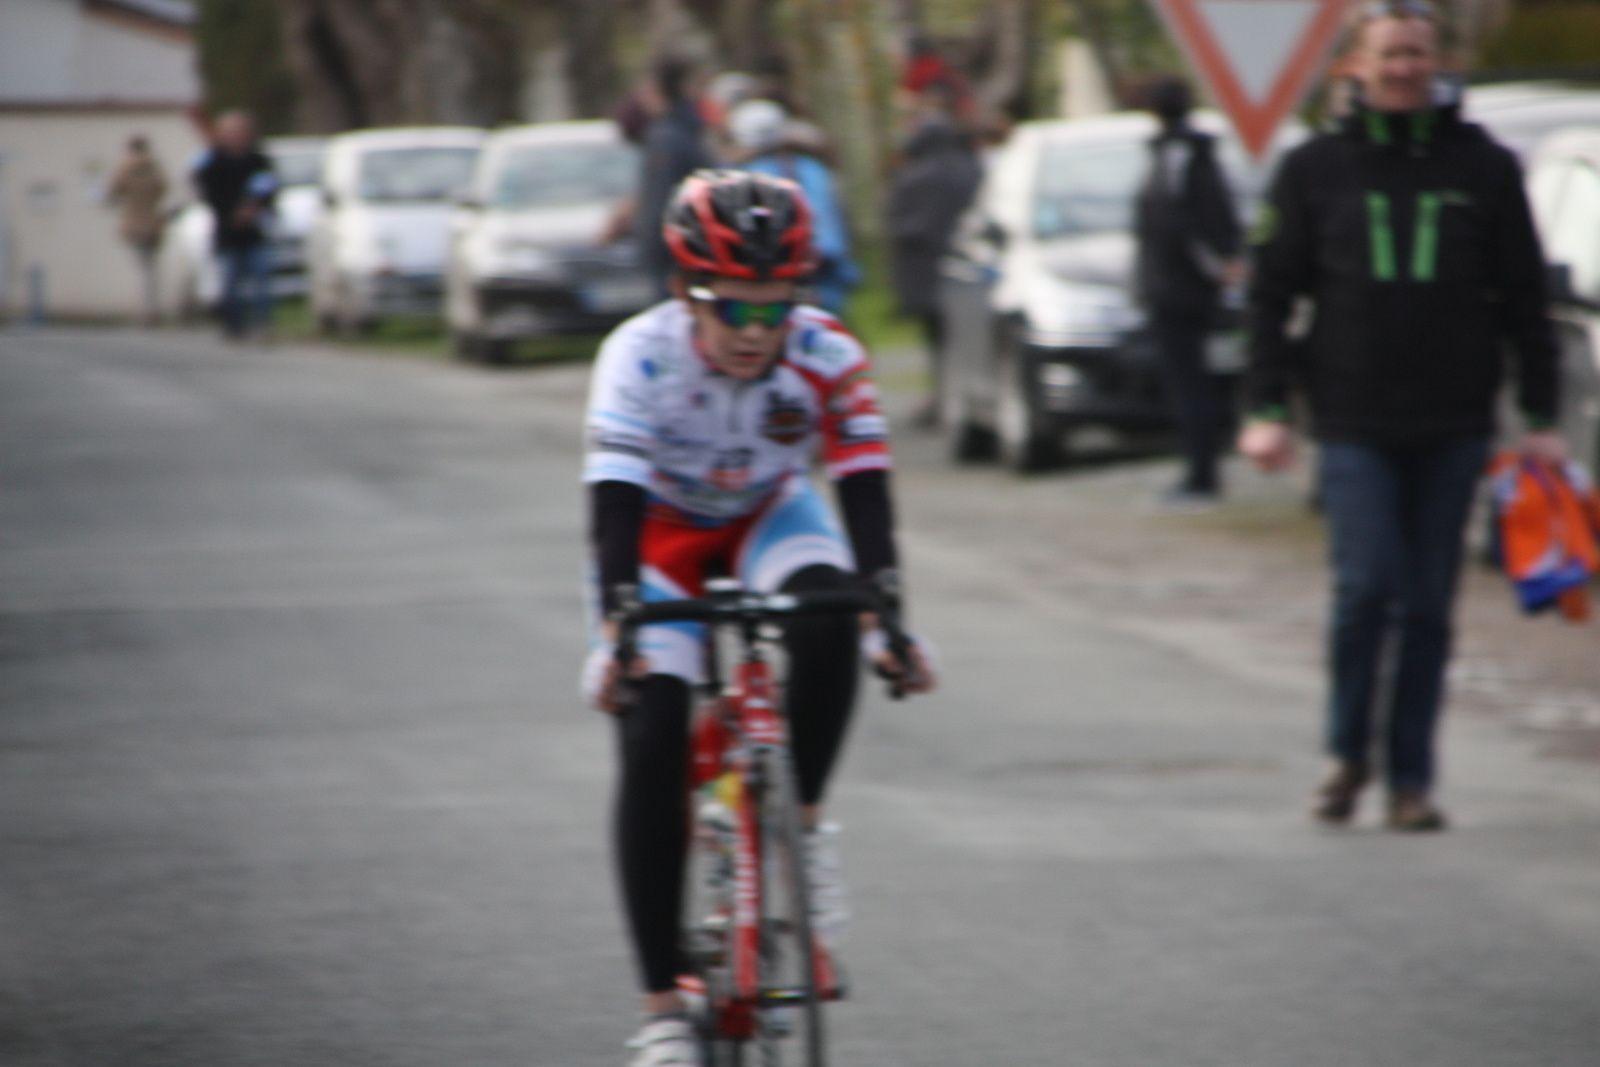 16e  Lothaire  PICHOT(VCCO), 17e  Nolan  GUINOT(VC Saintes), 18e  Maxence  PAUL(VC Rochefort)